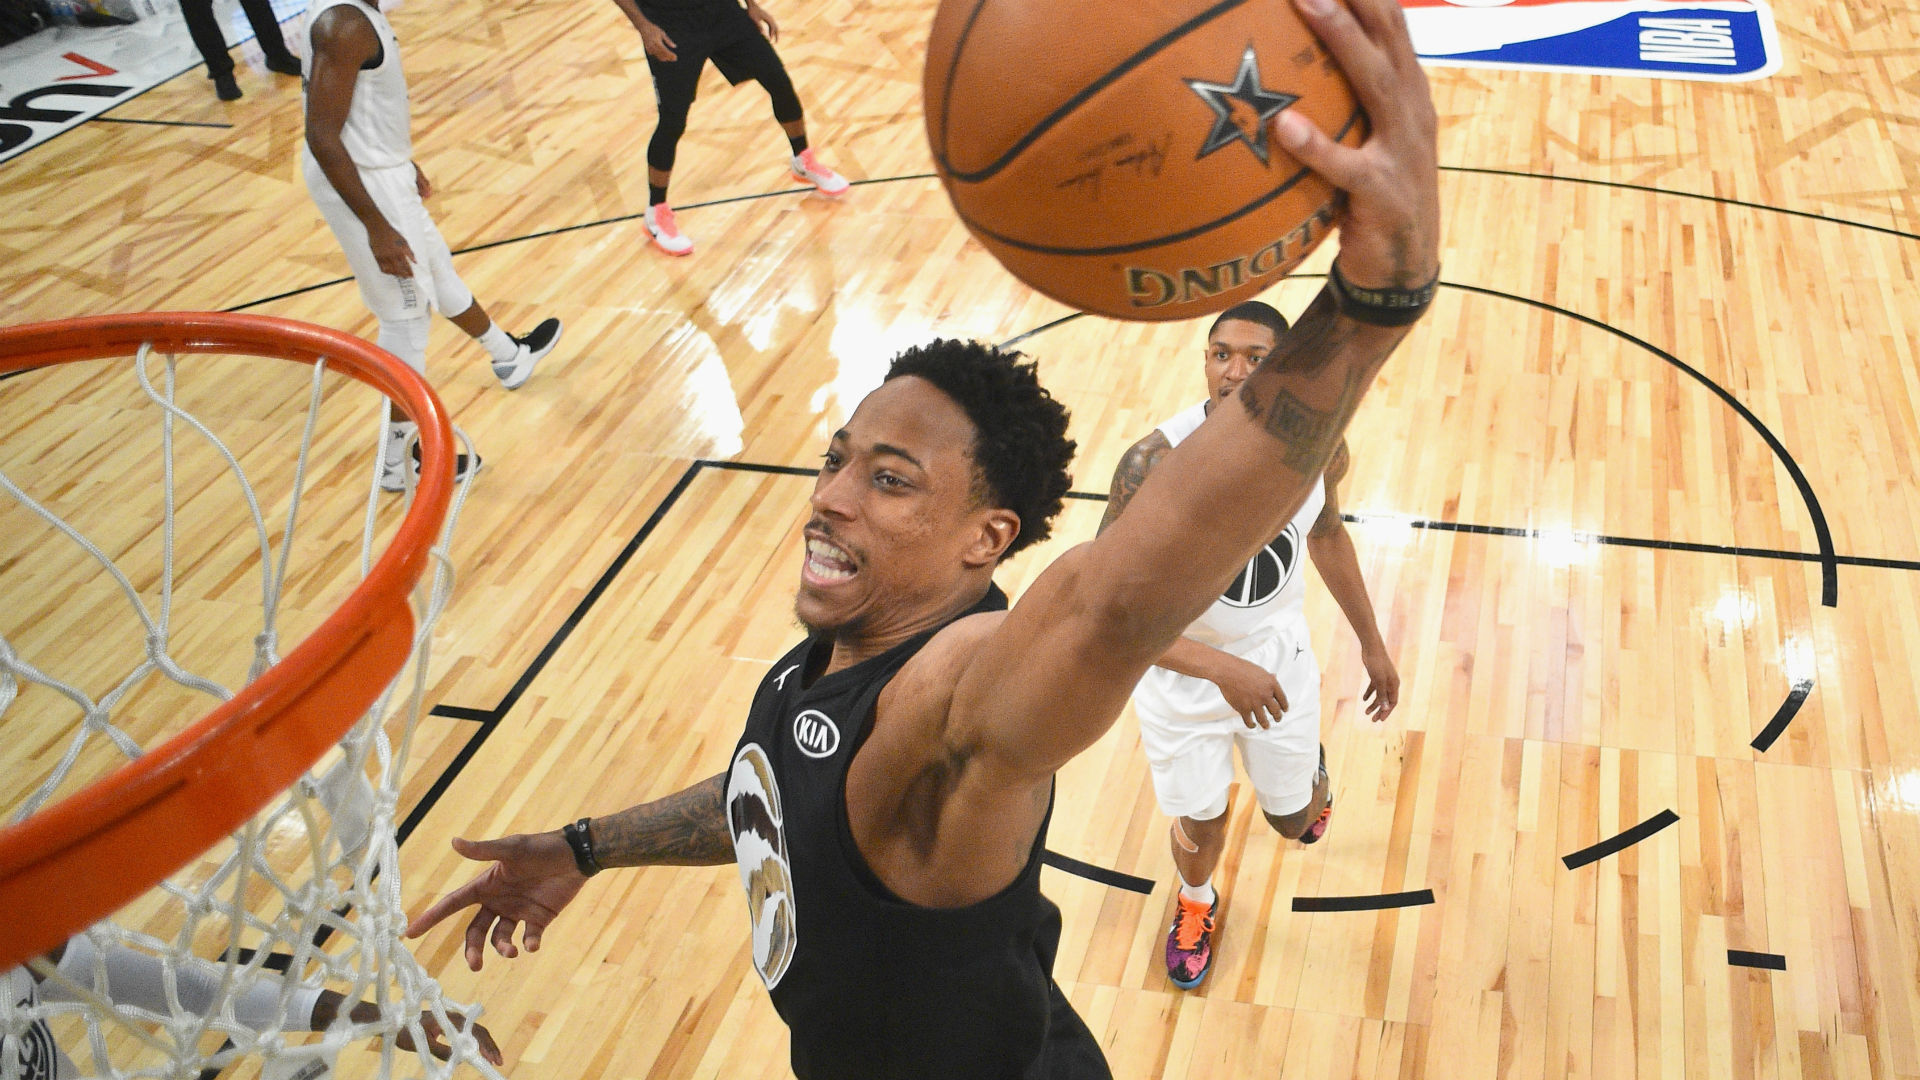 d8d35ae6777a NBA 2K ratings revealed for Kawhi Leonard